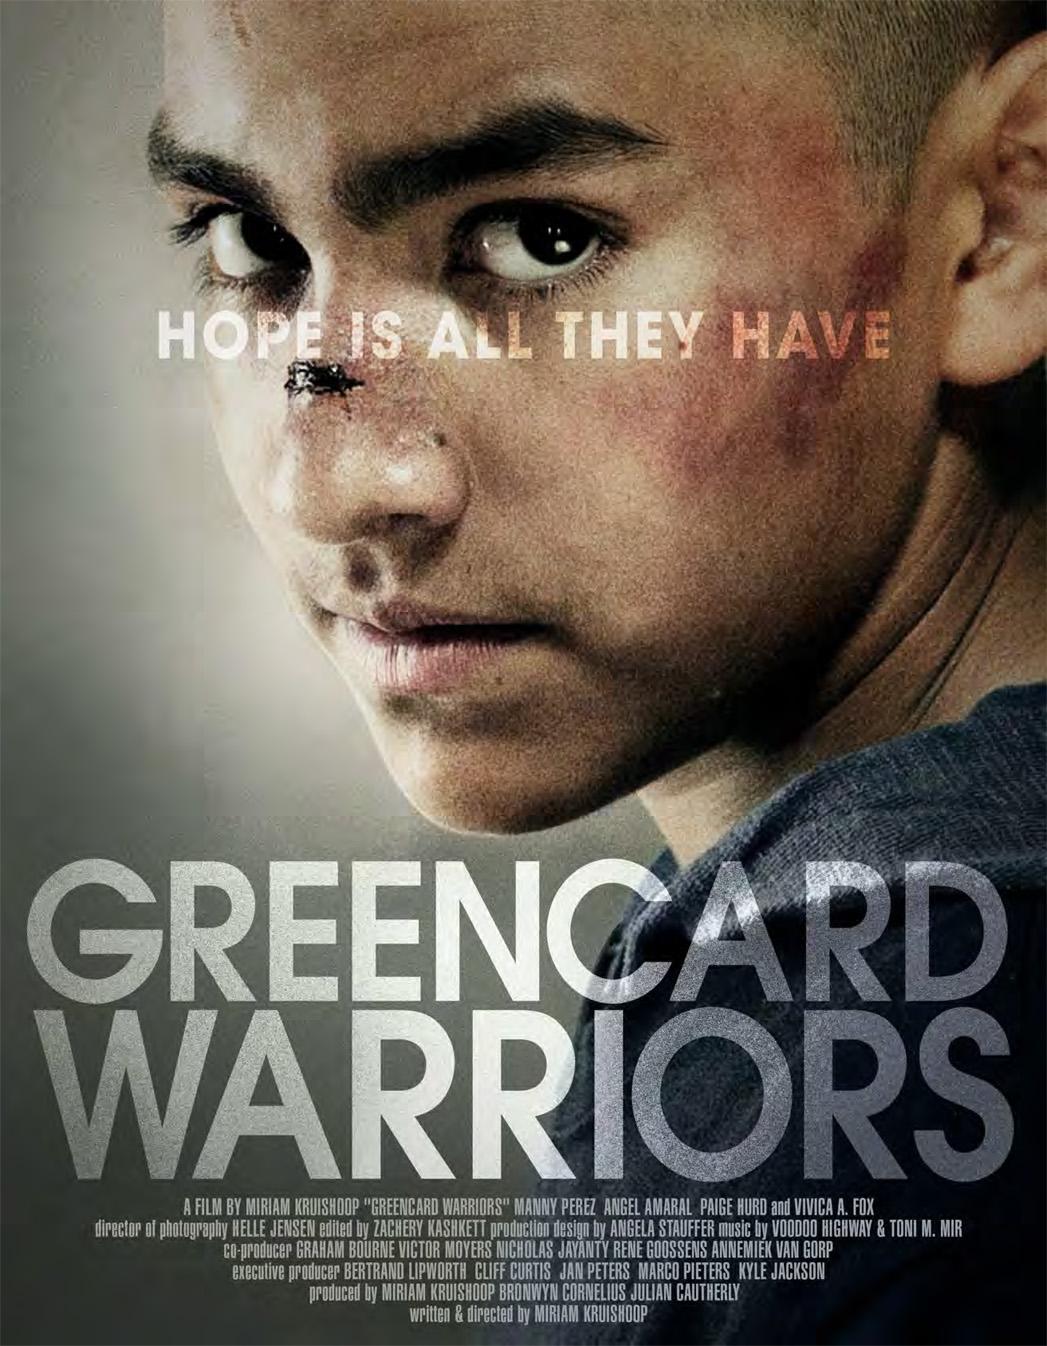 Greencard Warriors Poster - P 2014